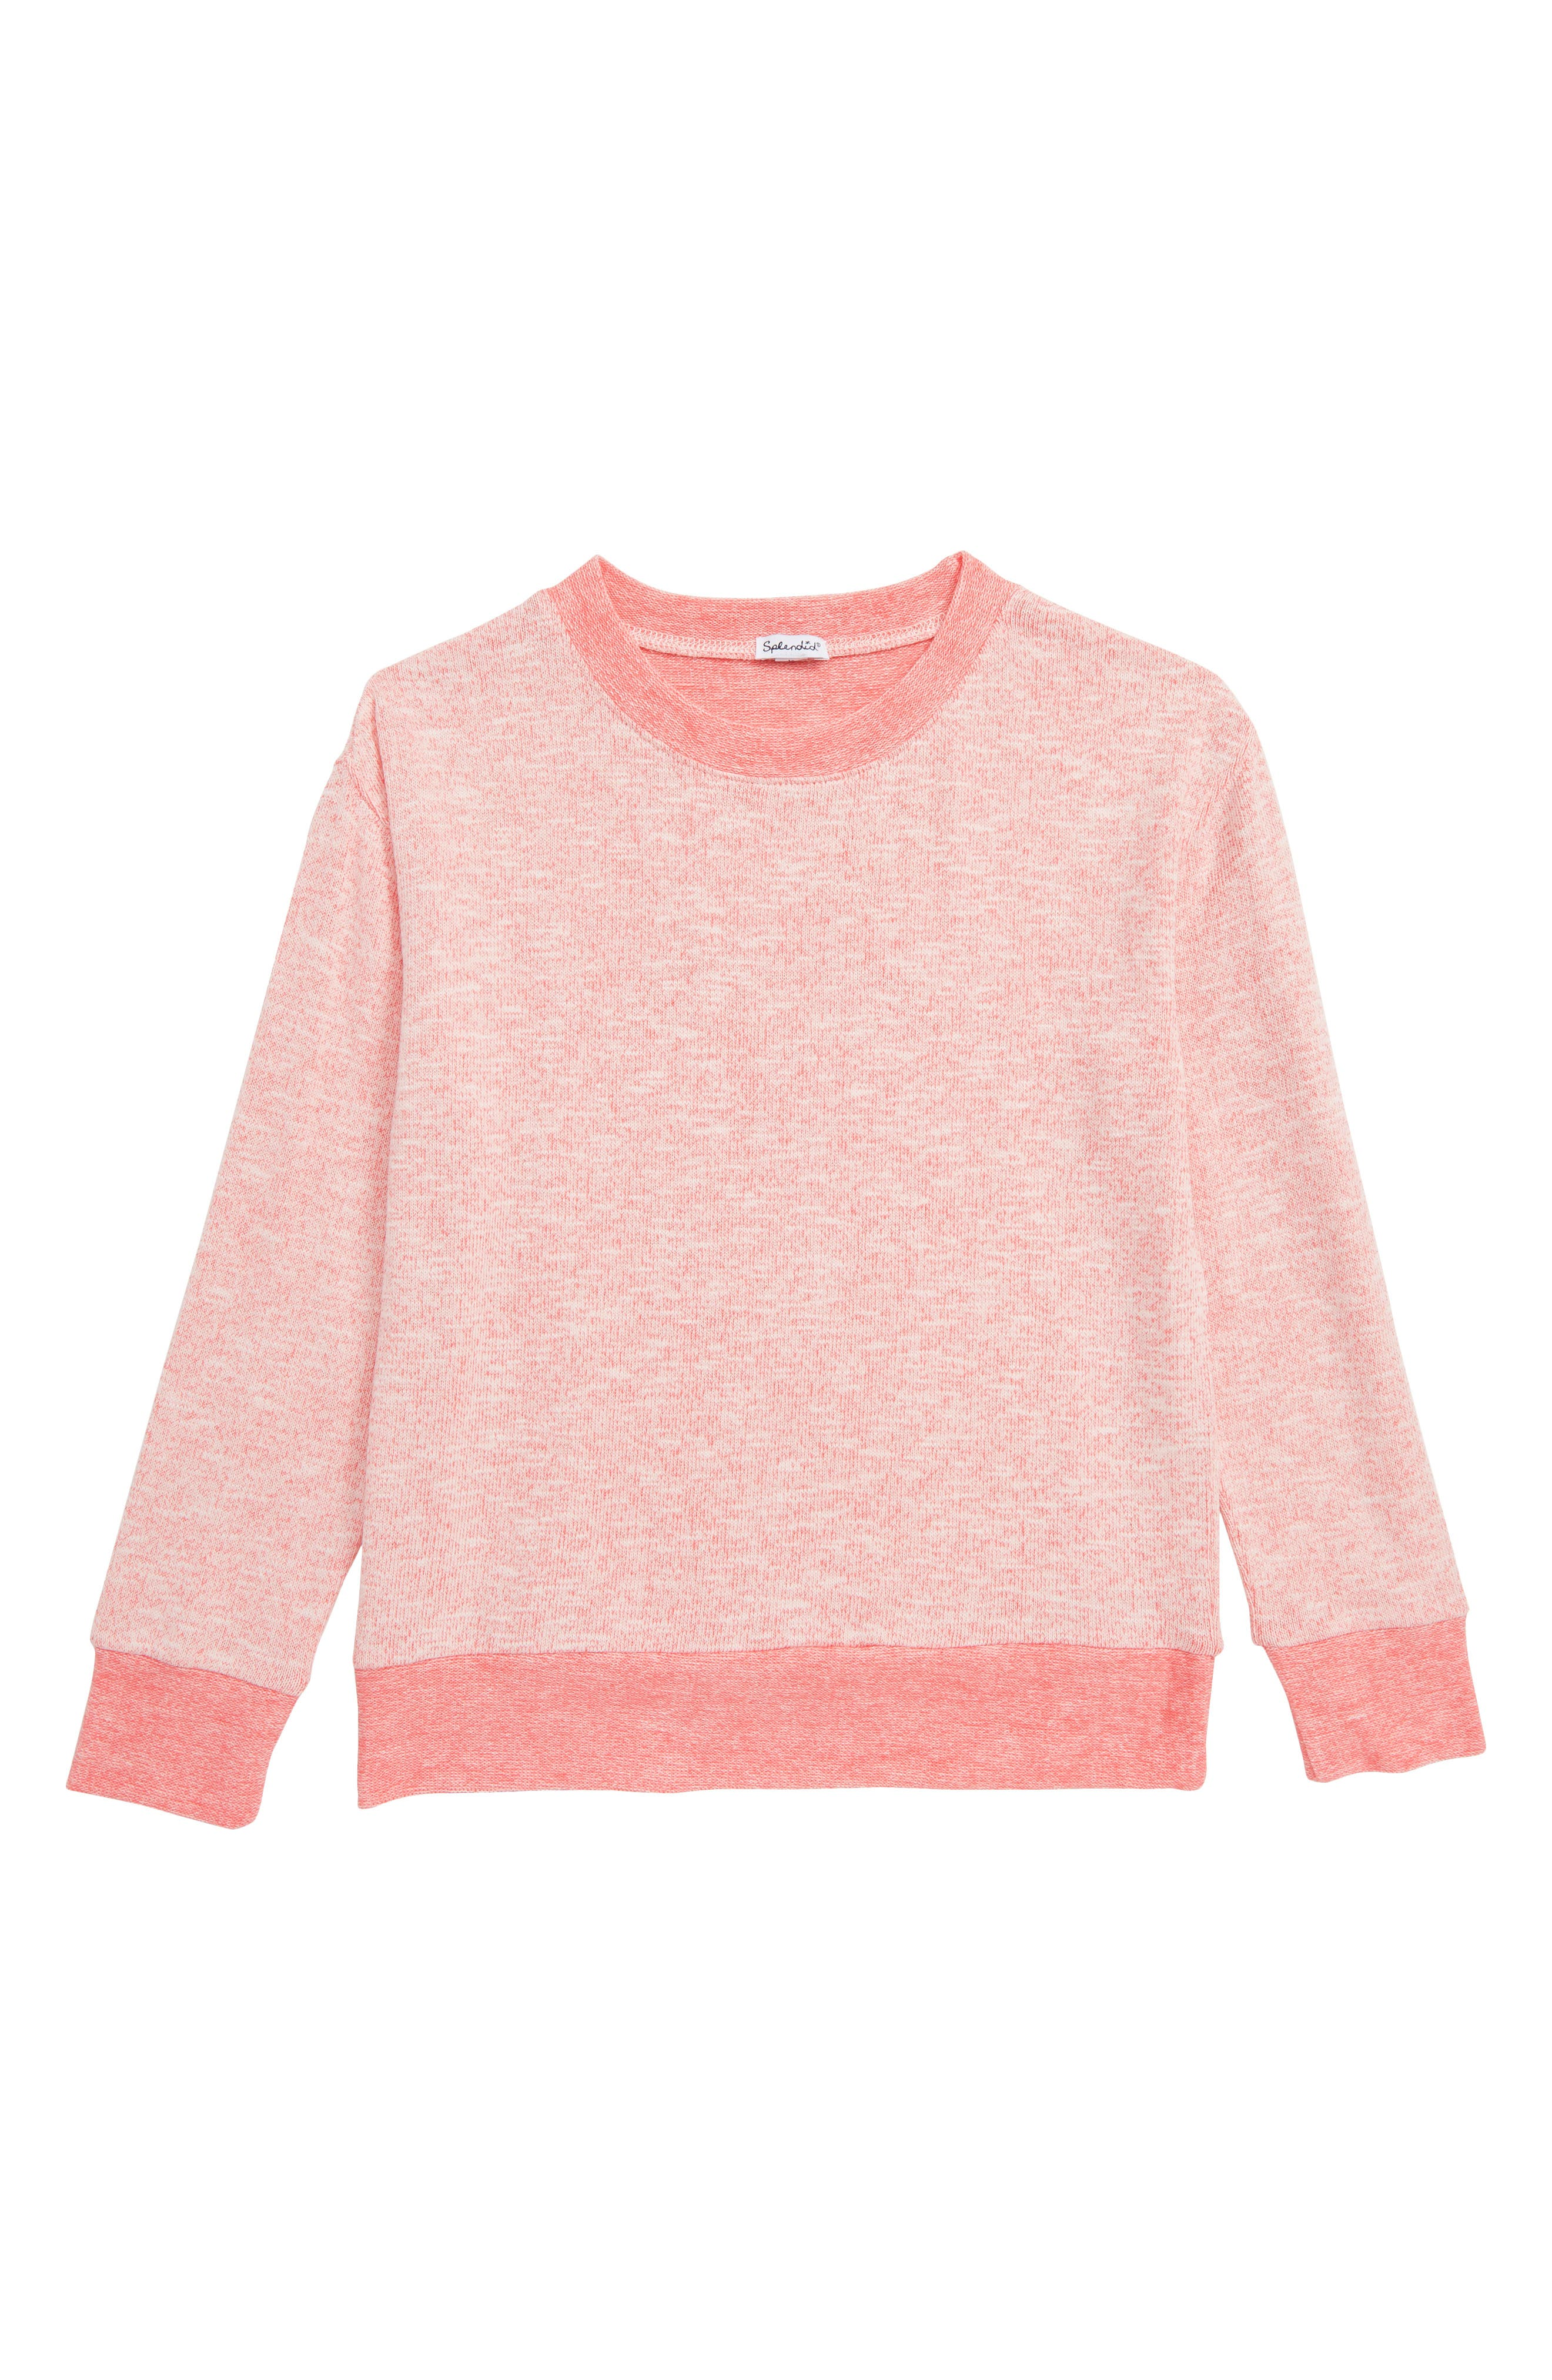 SPLENDID,                             Knit Top,                             Main thumbnail 1, color,                             SHANGRI LA ROSE